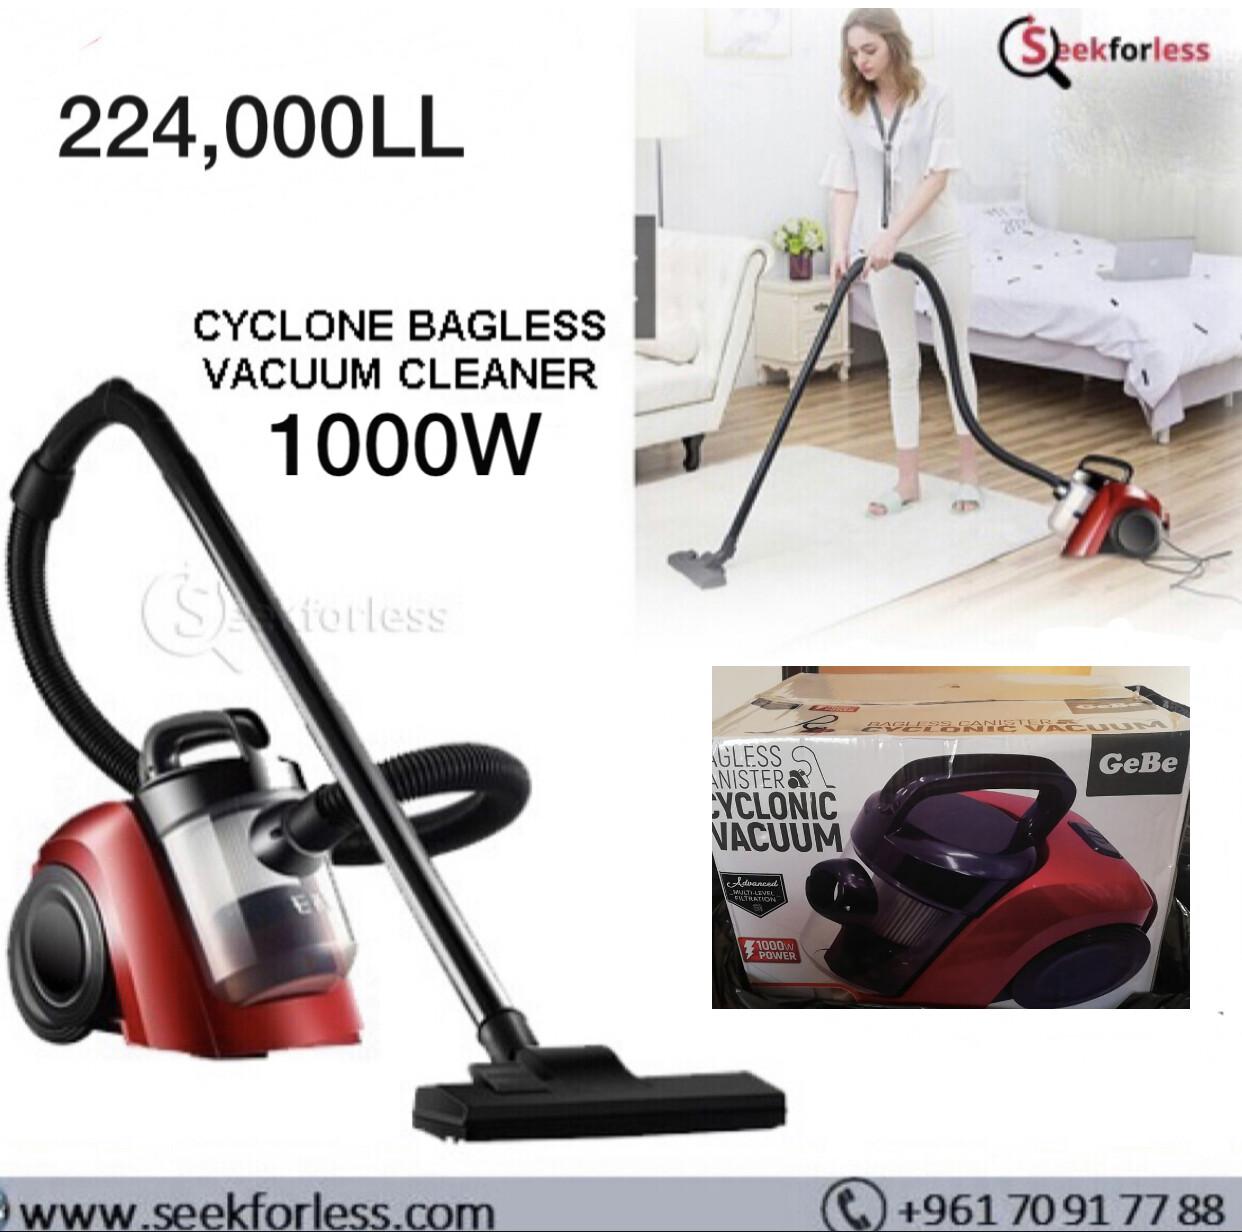 Cyclone Bagless Cleaner